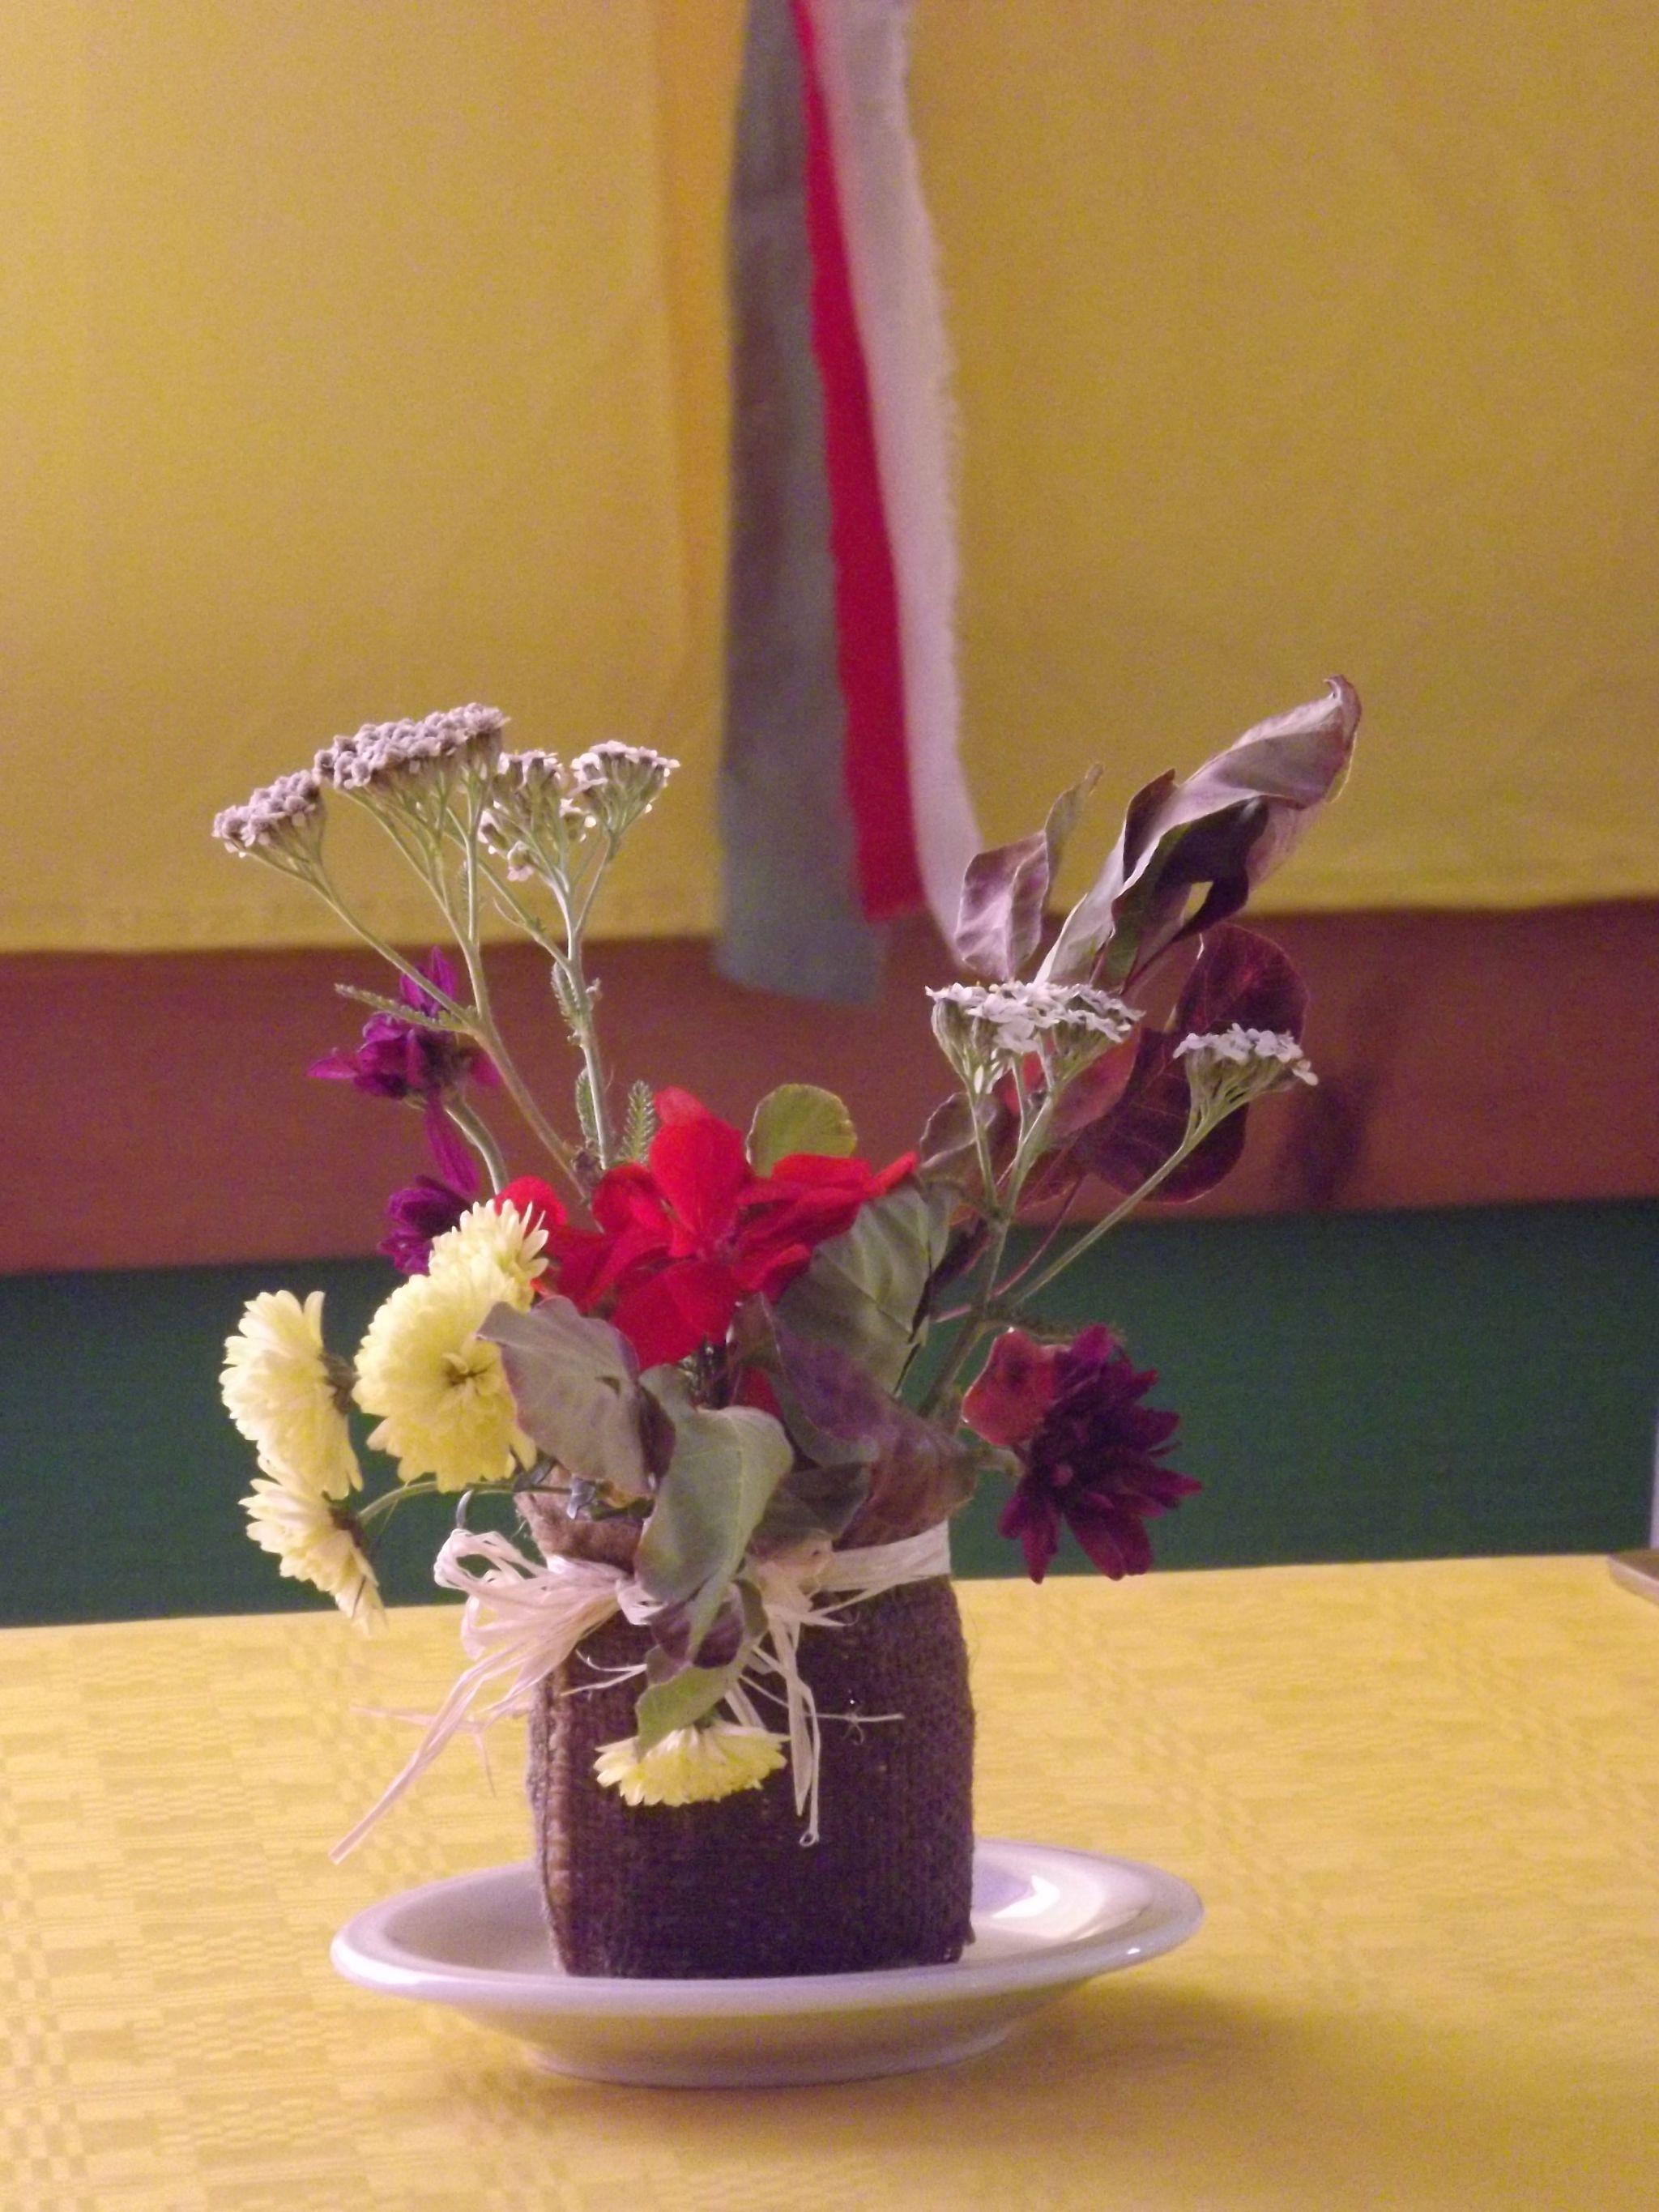 Repas vespa 2014 039.jpg